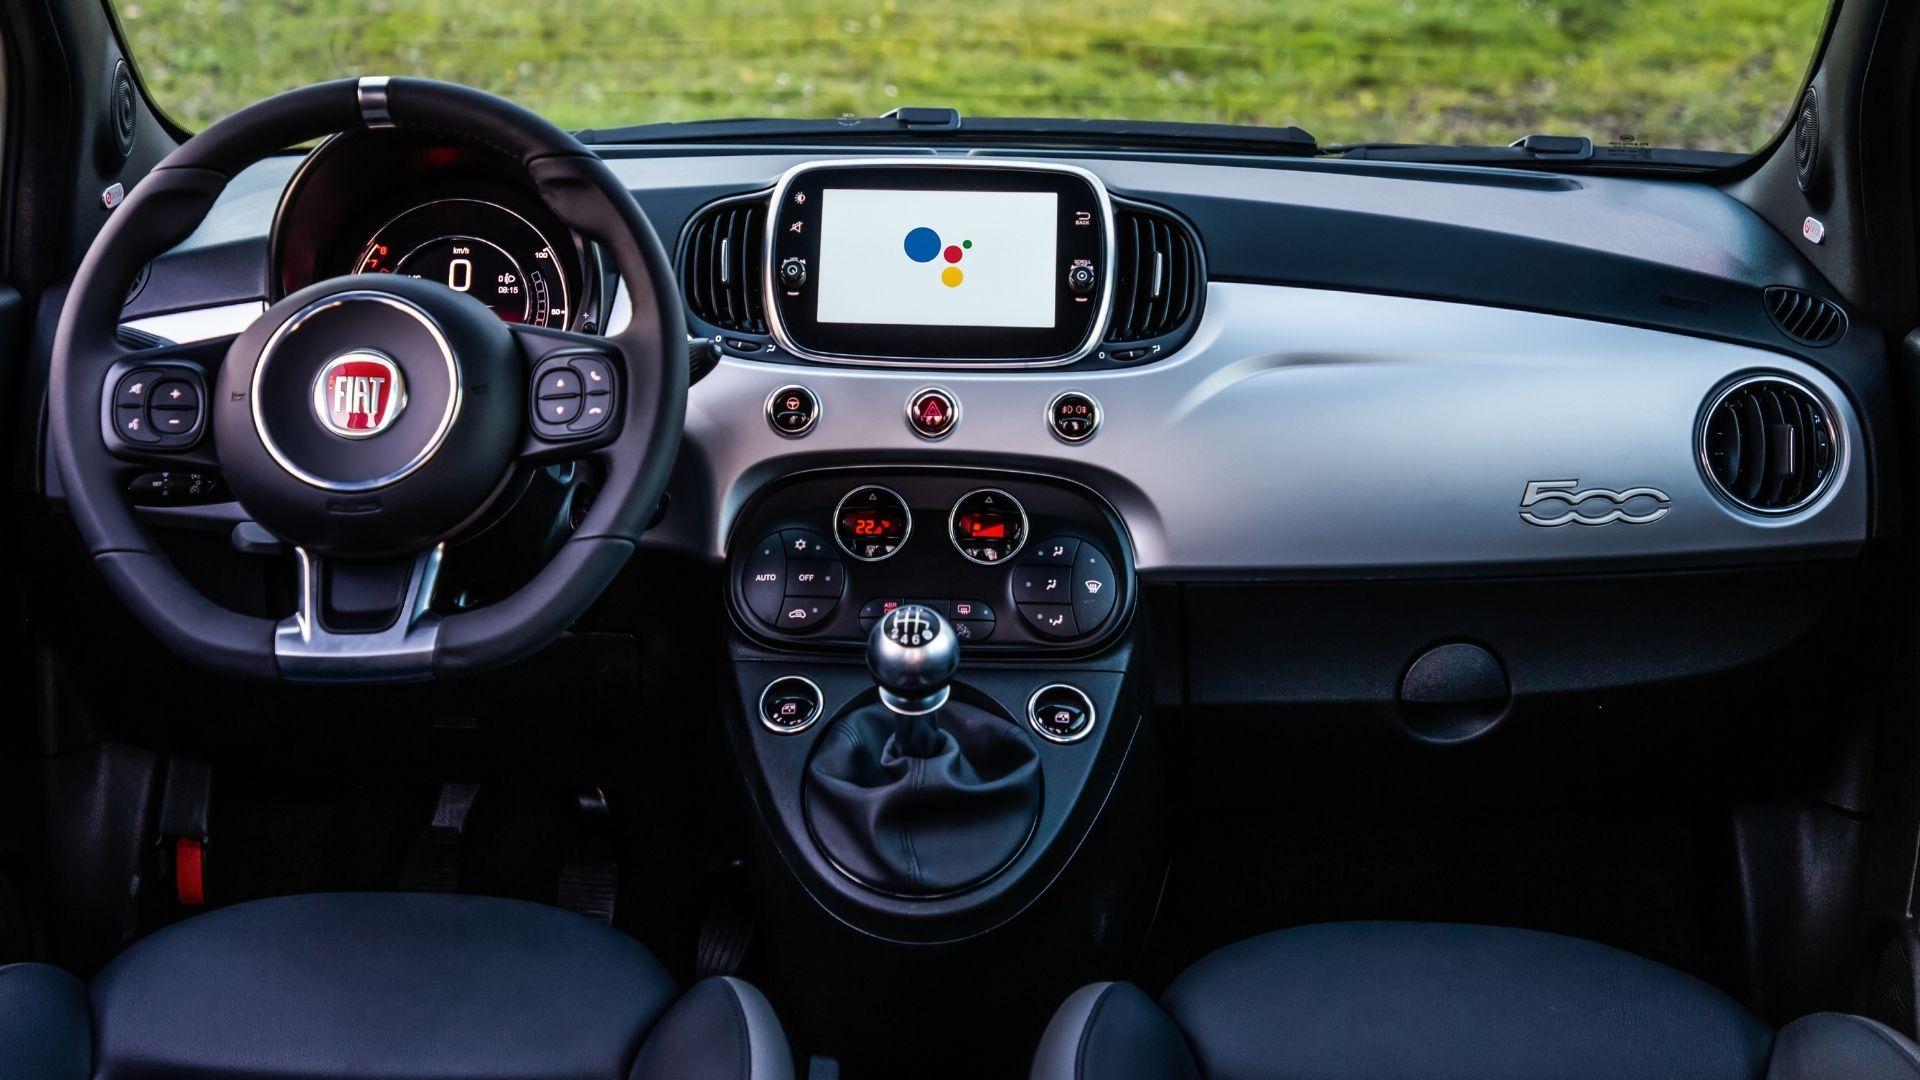 Fiat-500-Hey-Google-plancia